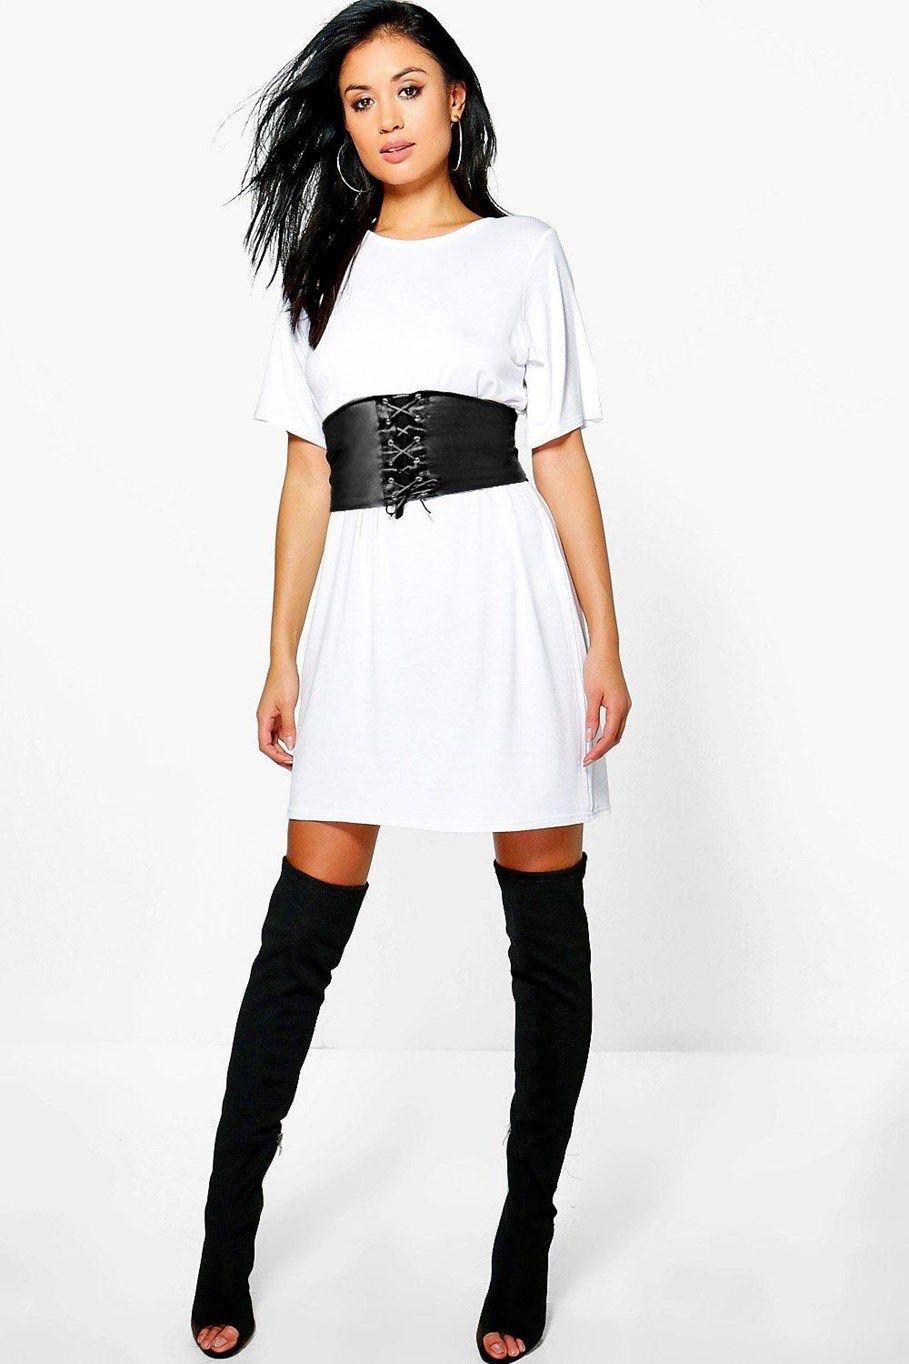 92459e4ef9b3 Harley Tee Dress, White T Shirt Dress, Belted Dress, Corset Outfit, Corset